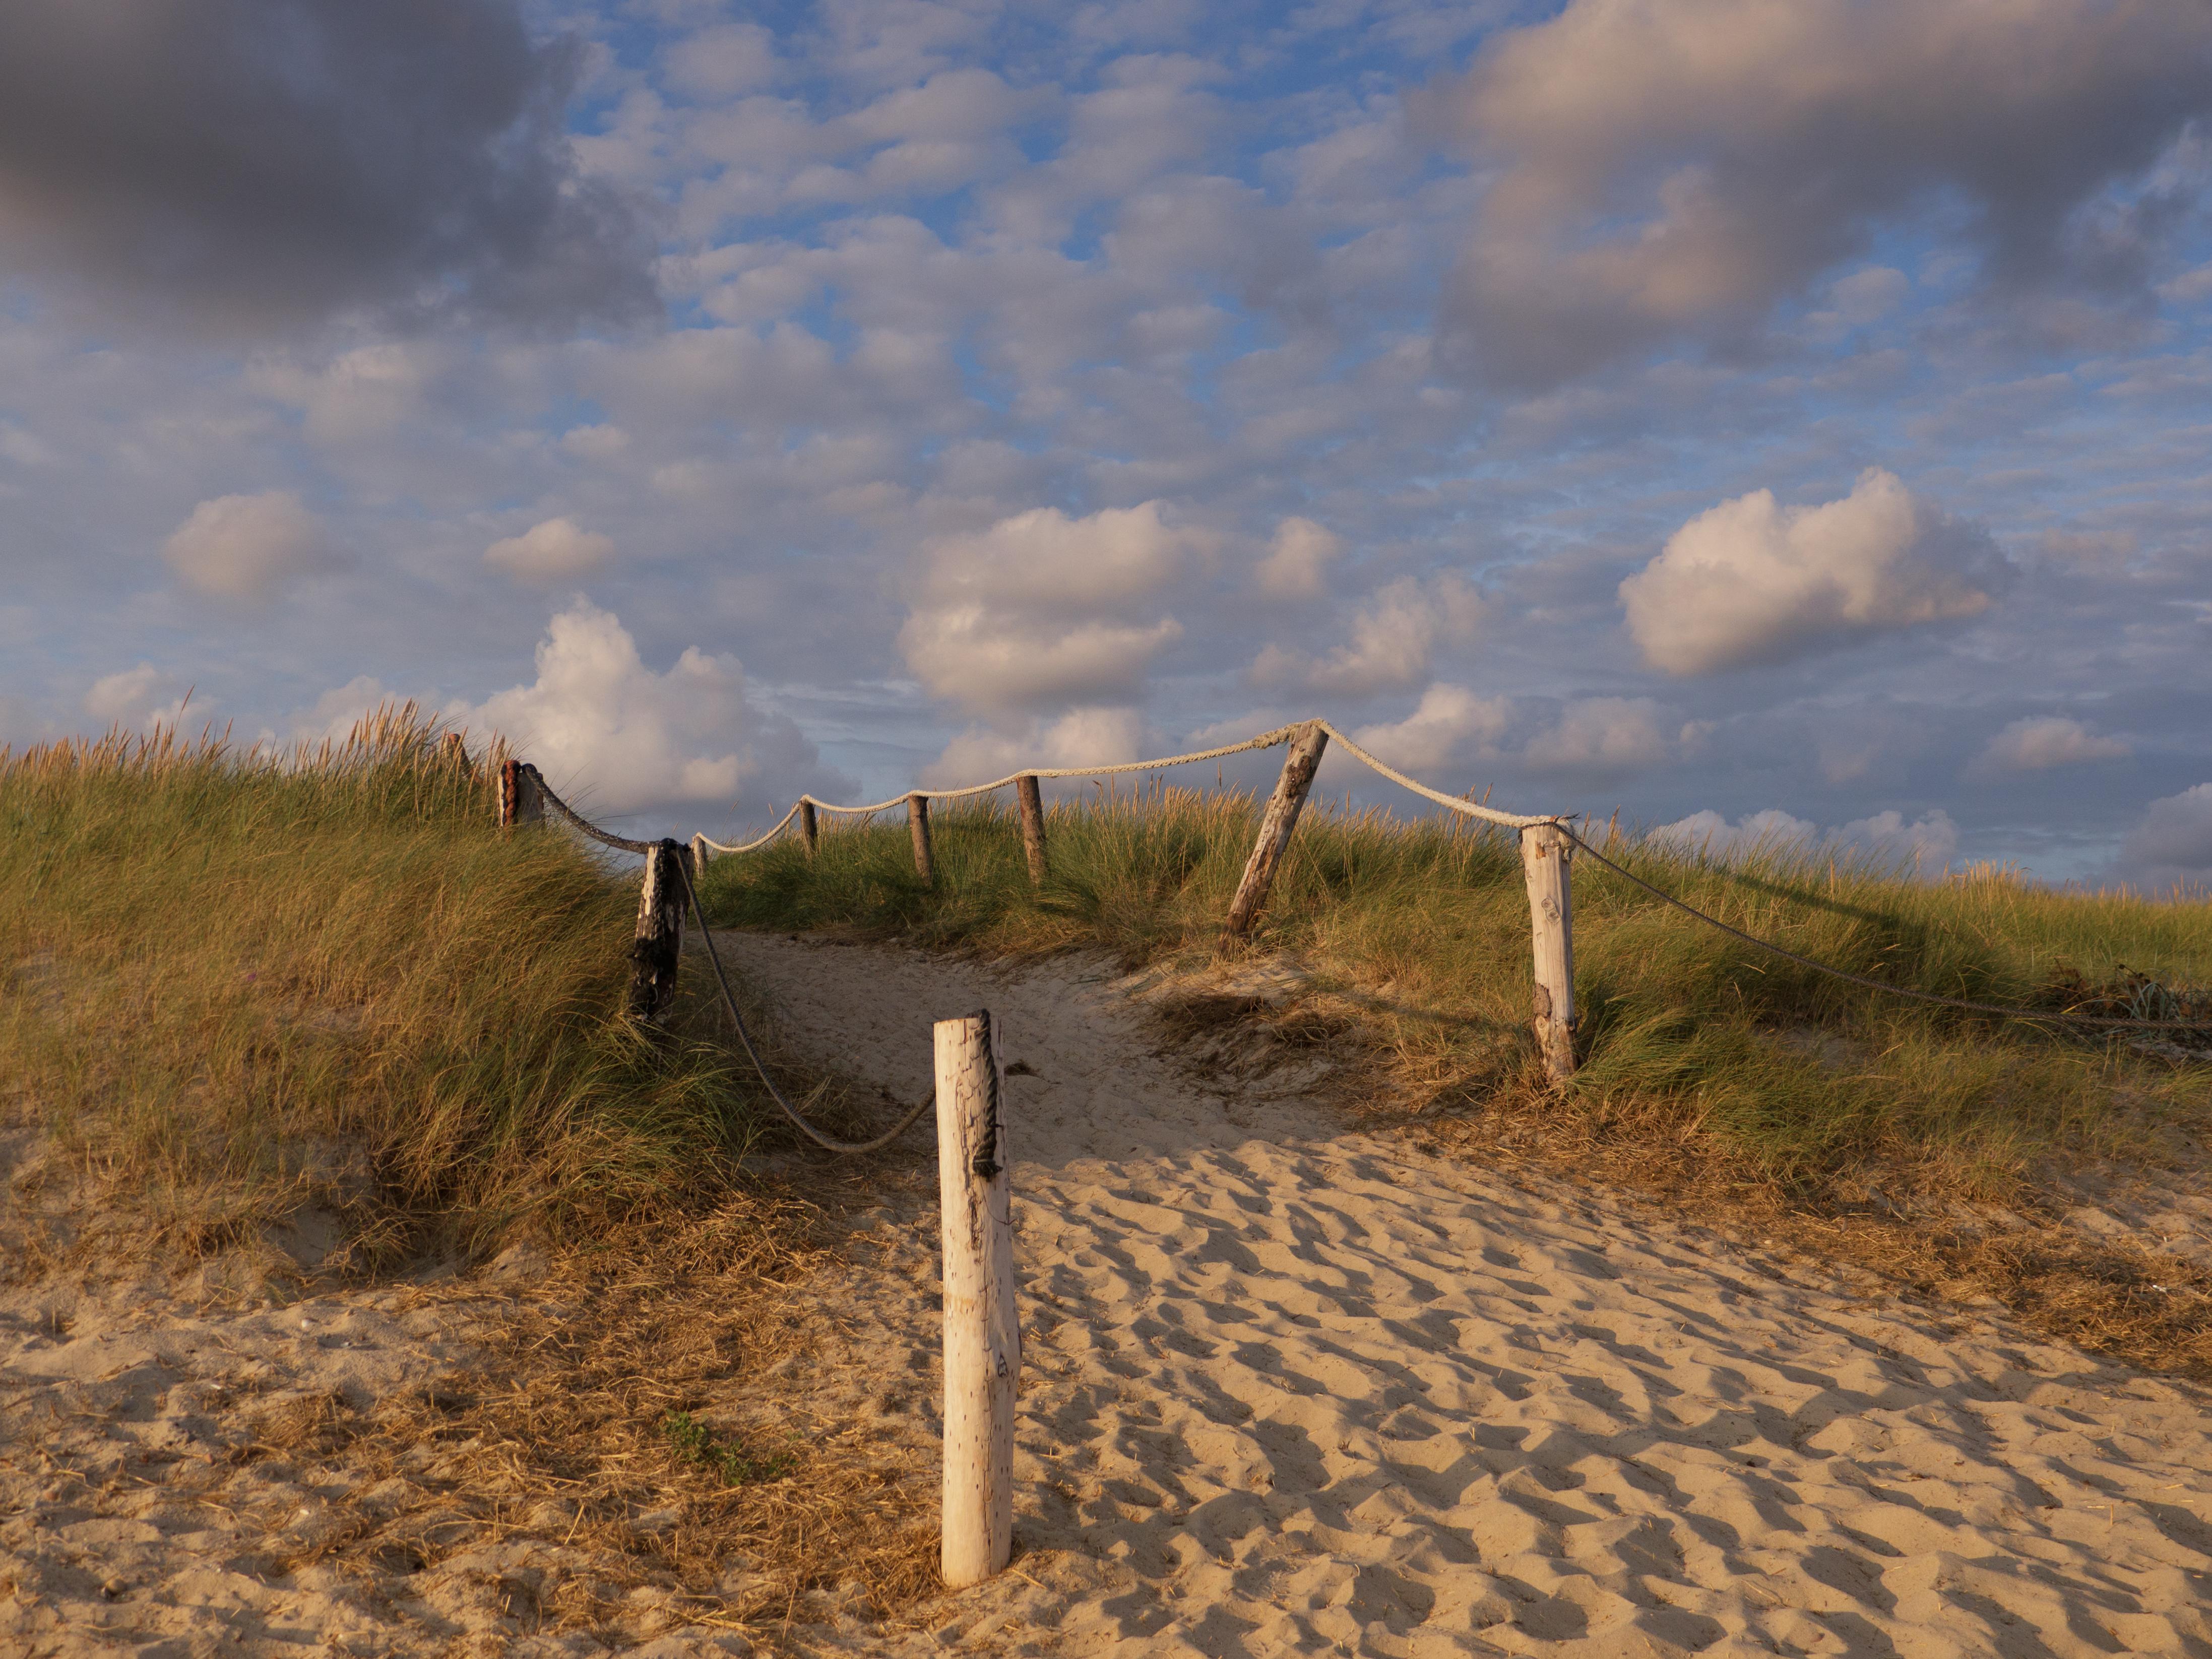 hintergrundbilder sonnenuntergang strand natur landschaft d nemark abend bew lkt d ne. Black Bedroom Furniture Sets. Home Design Ideas